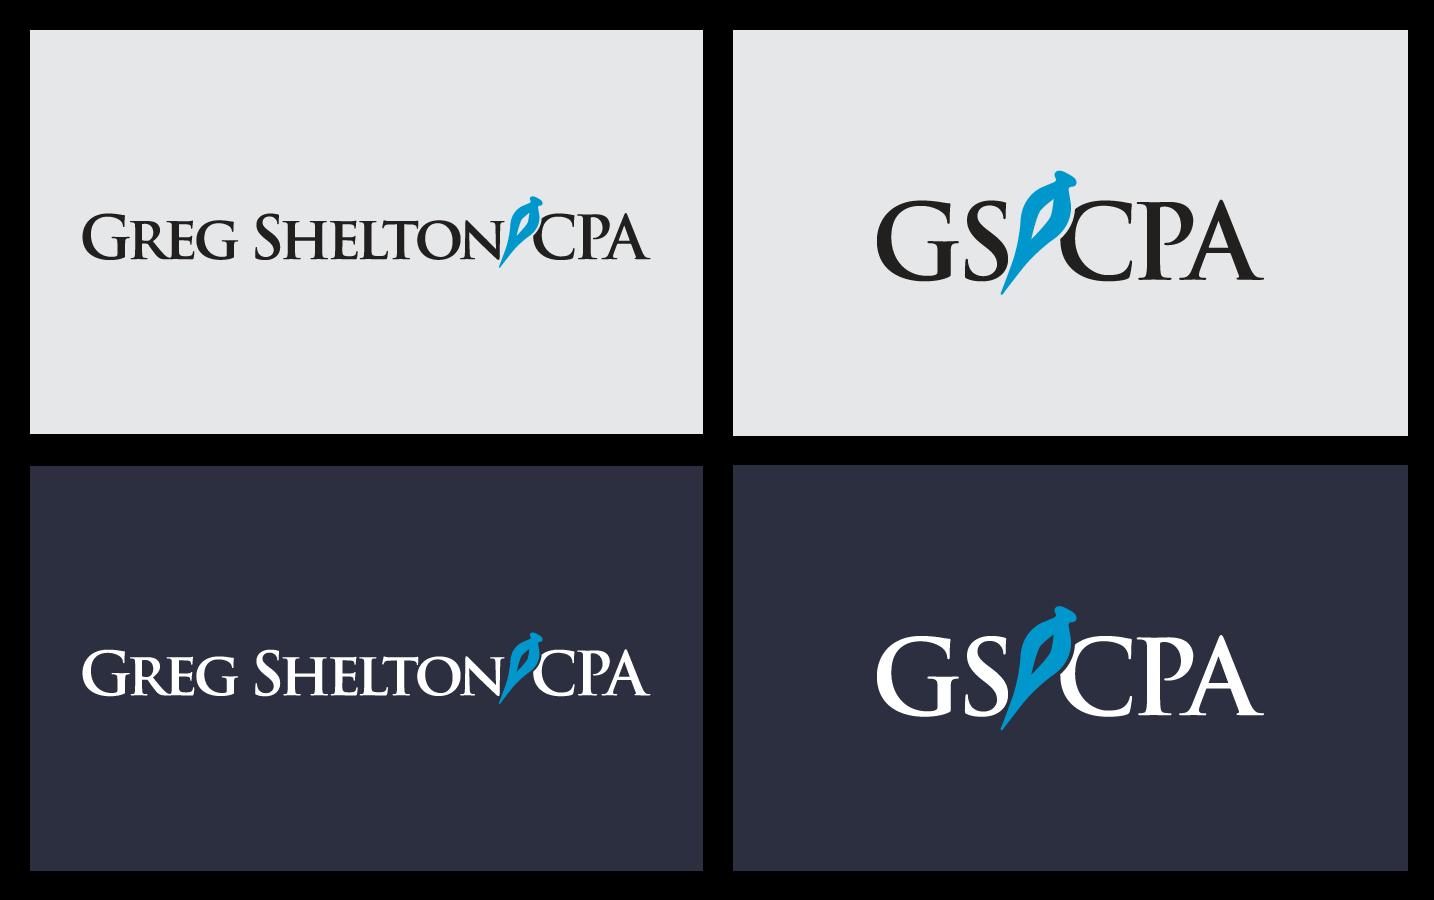 Greg-Shelton-CPA_Logo-Design_Lockup_Dreamcapture_Memphis-TN